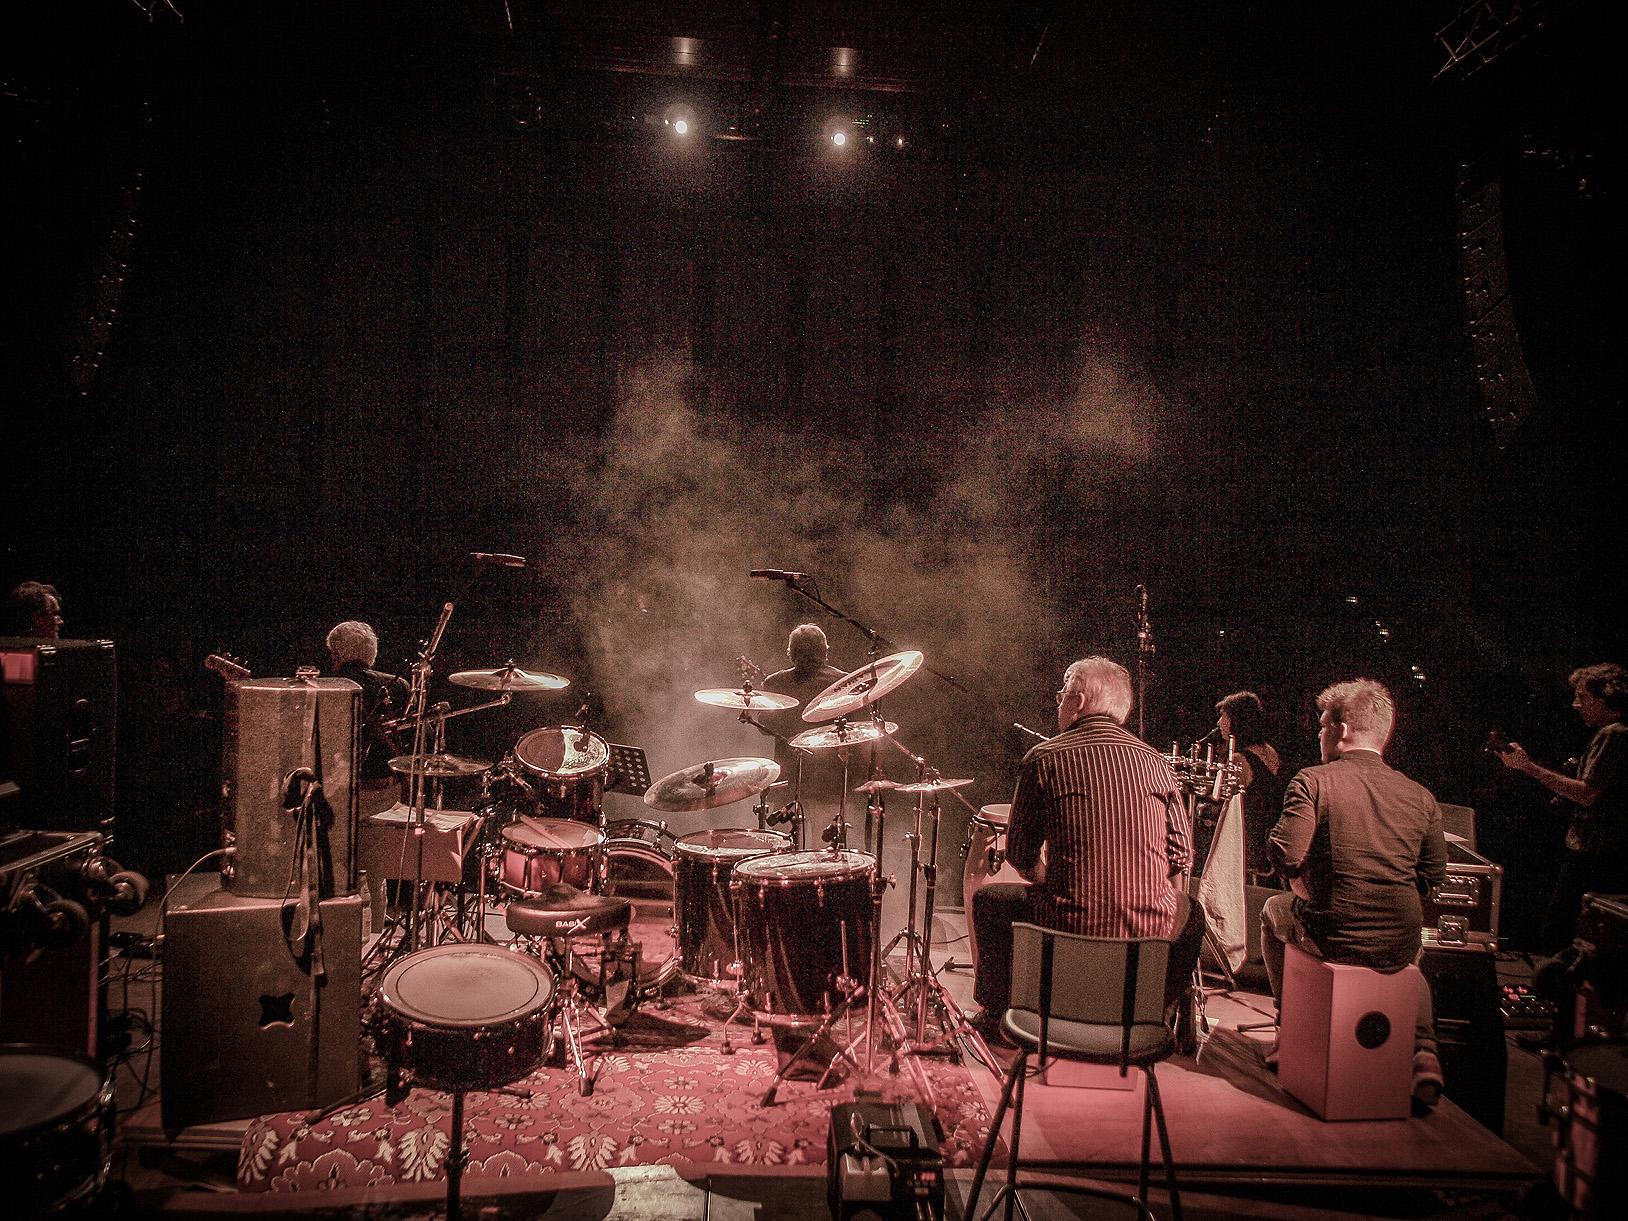 concert: The young man, Weihnachtssession, Sindelfingen, dec 26, 2013   photo  2013©Helmut Bail